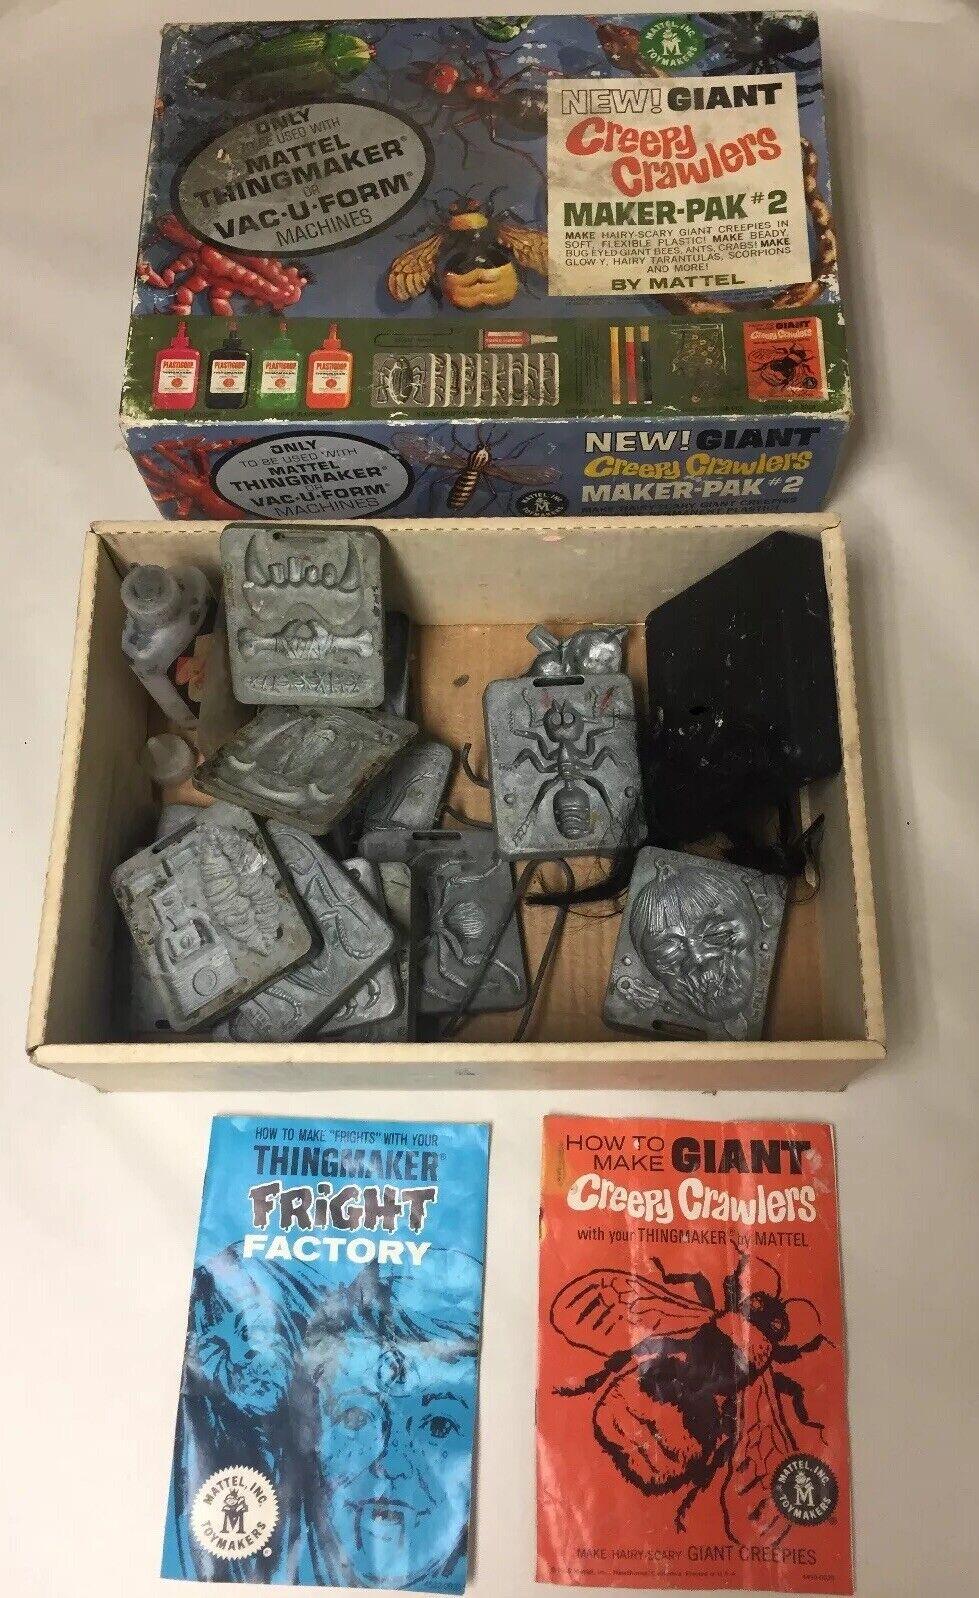 VINTAGE MATTEL 1960'S GIANT CREEPY CRAWLERS THINGMAKER MAKER-PAK